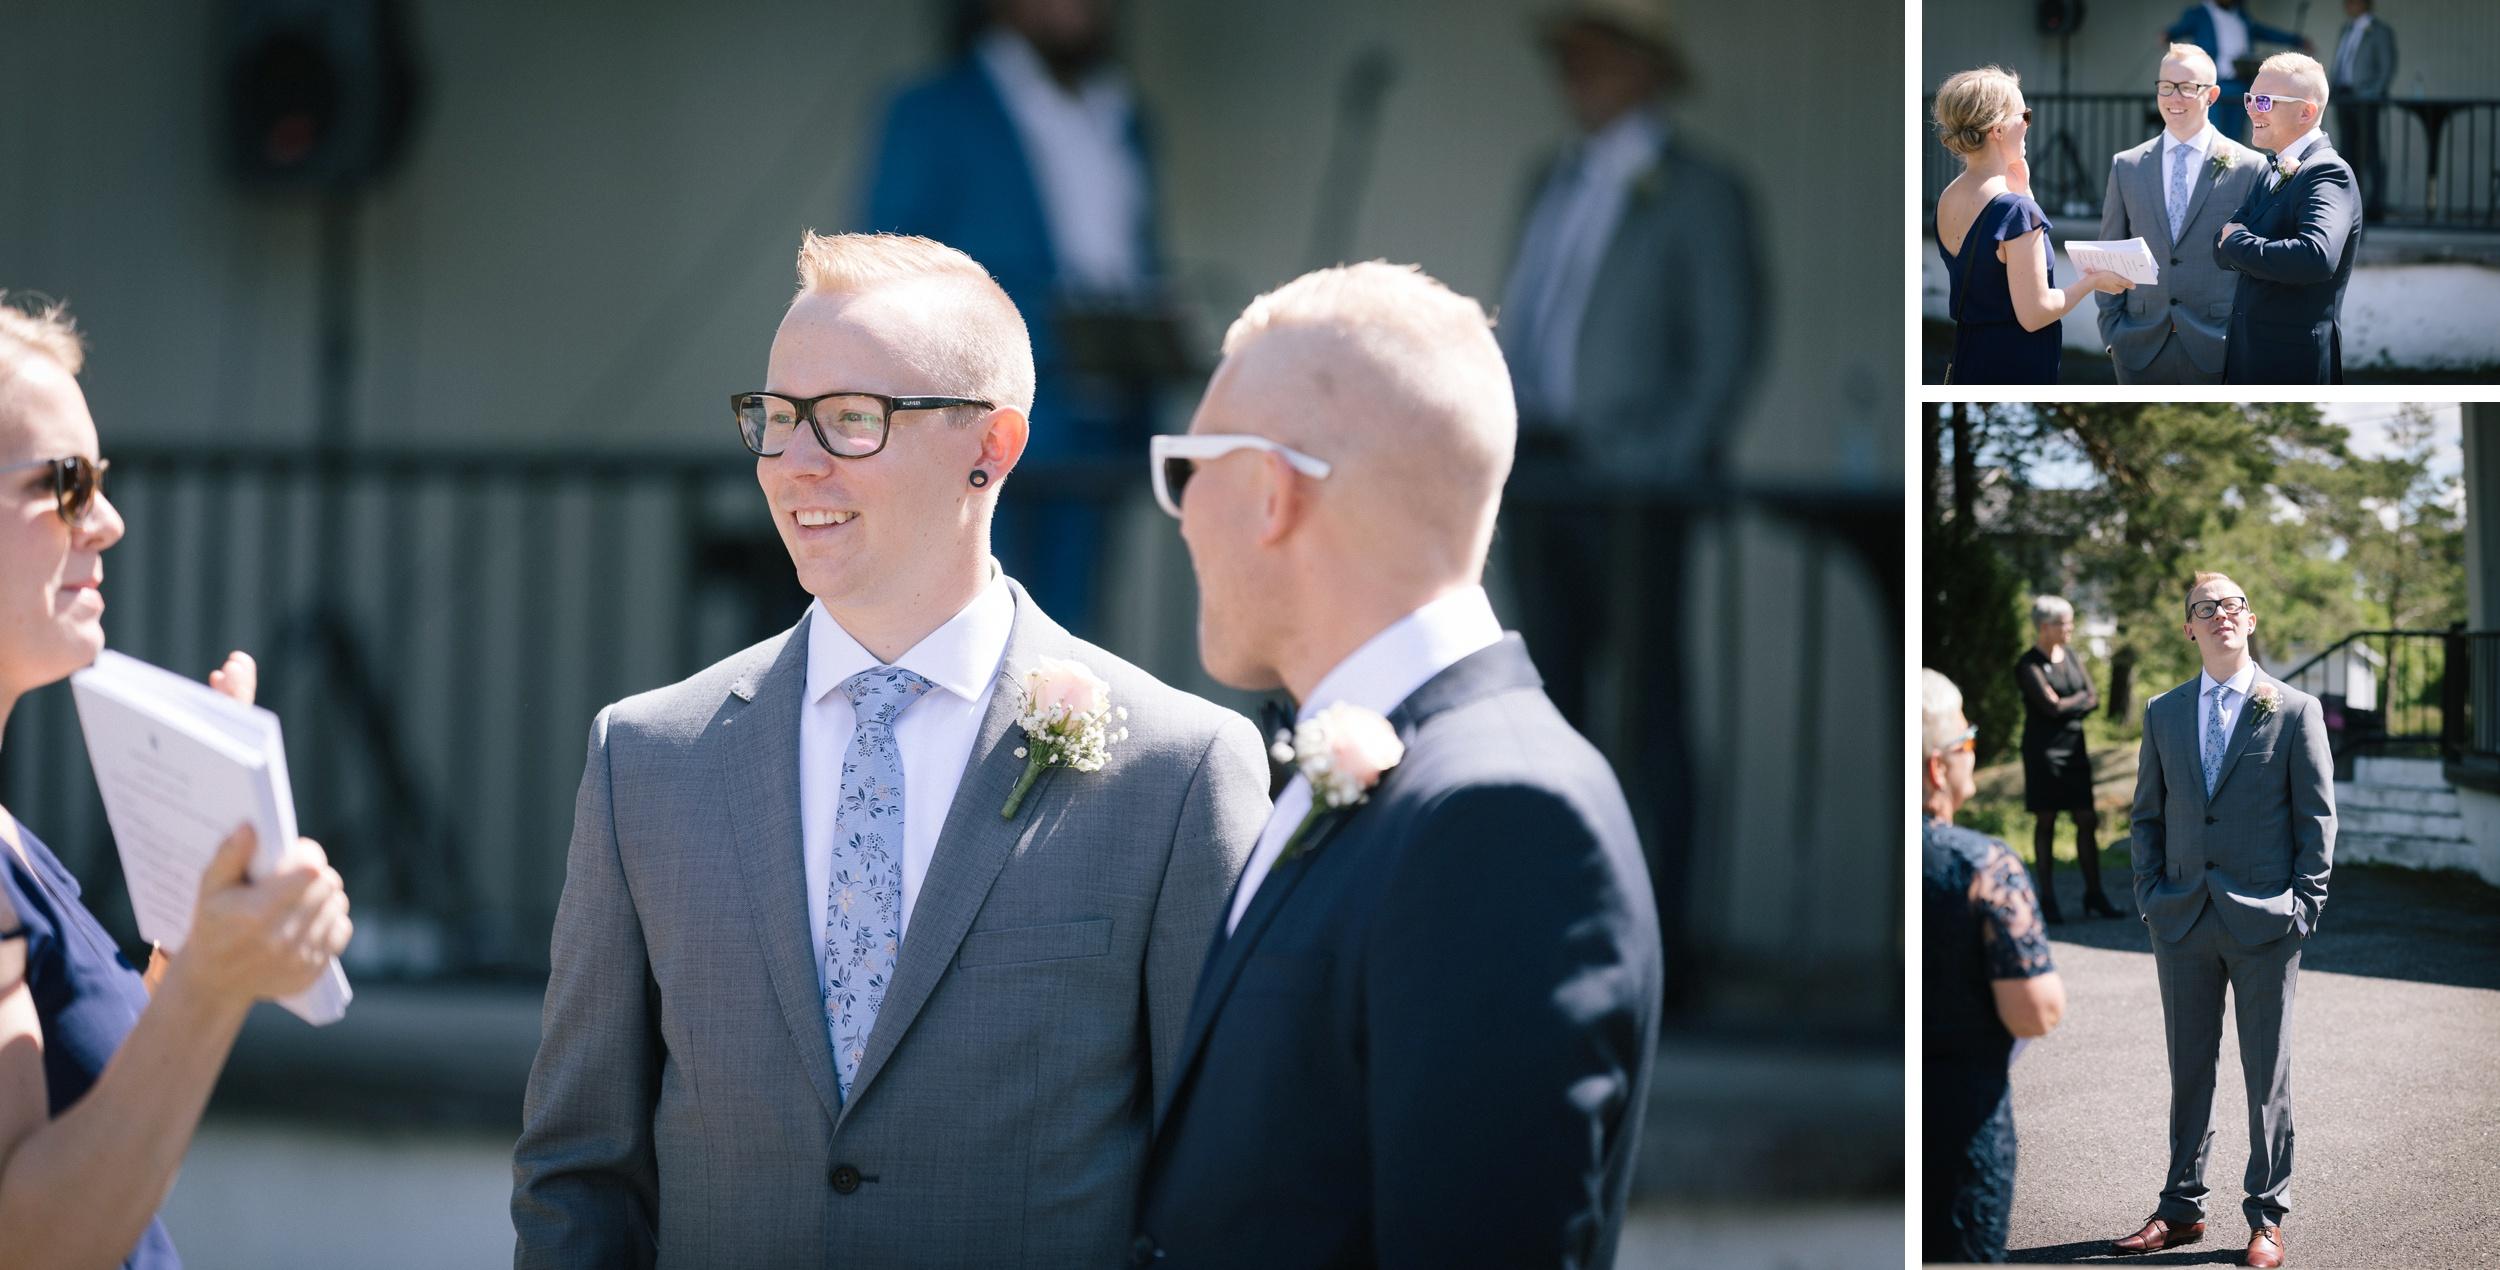 bryllup-bryllupsfotografering-bryllupsfotograf-sarpsborg-20170617-_H2A1698anneli_phillip_WEB.jpg